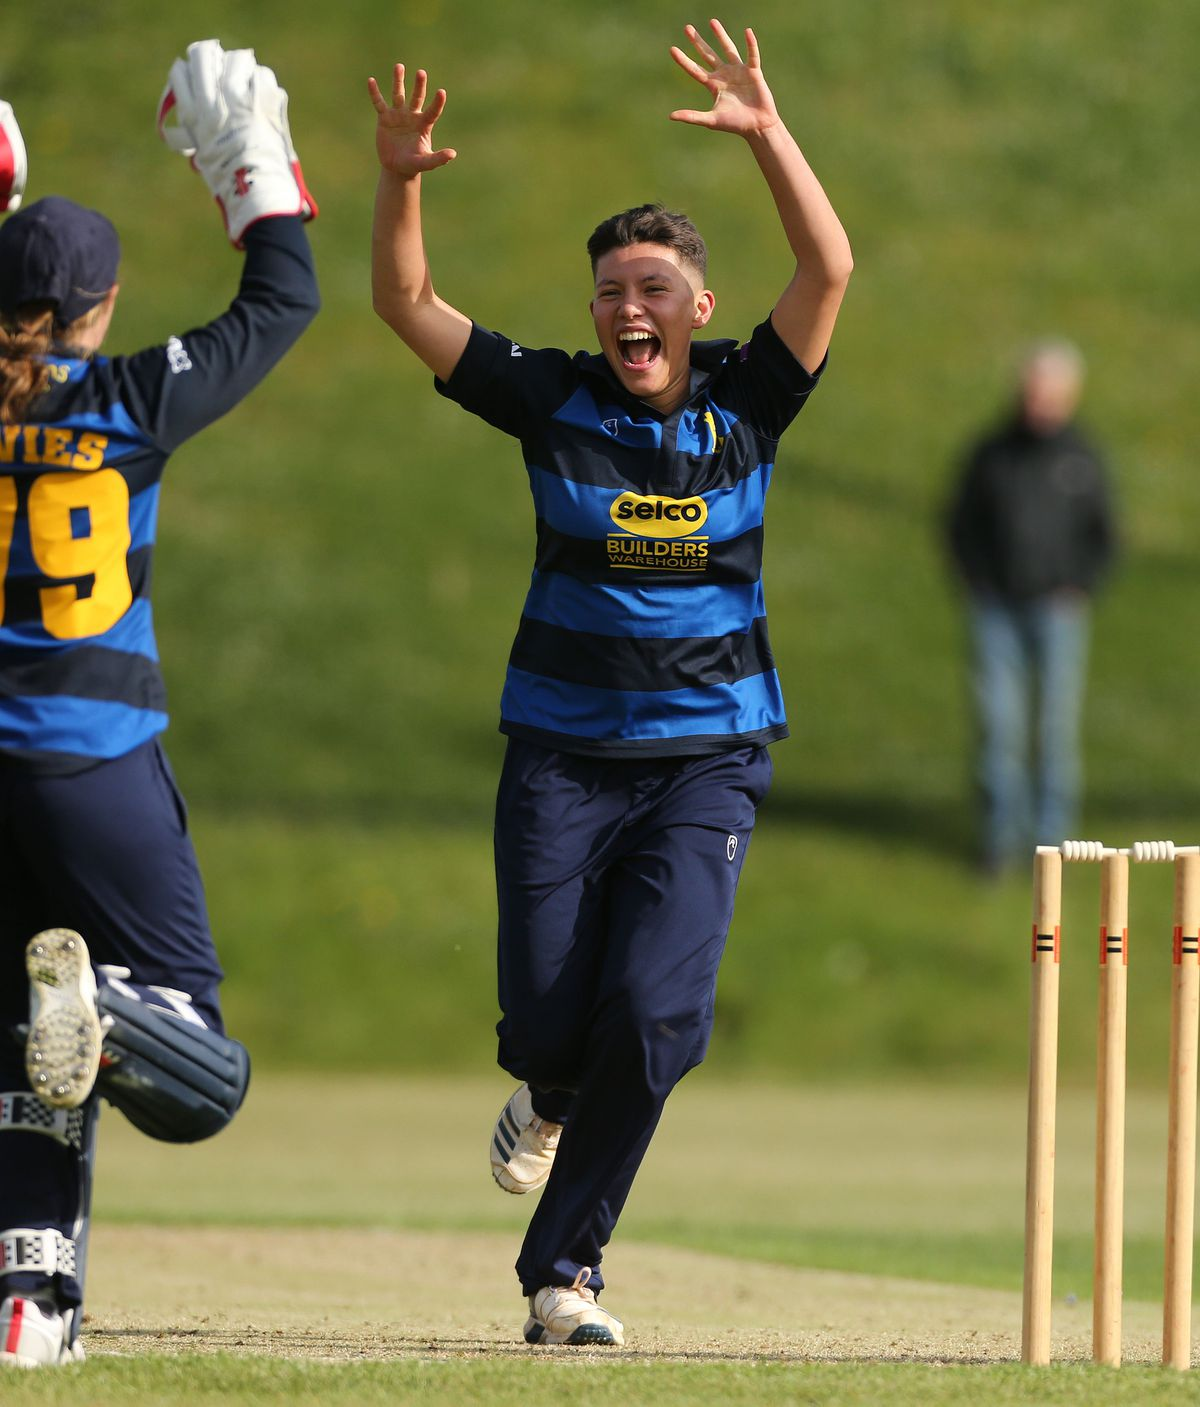 Issy Wong of Warwickshire celebrates taking a wicket (Photo: Tony Marsh)